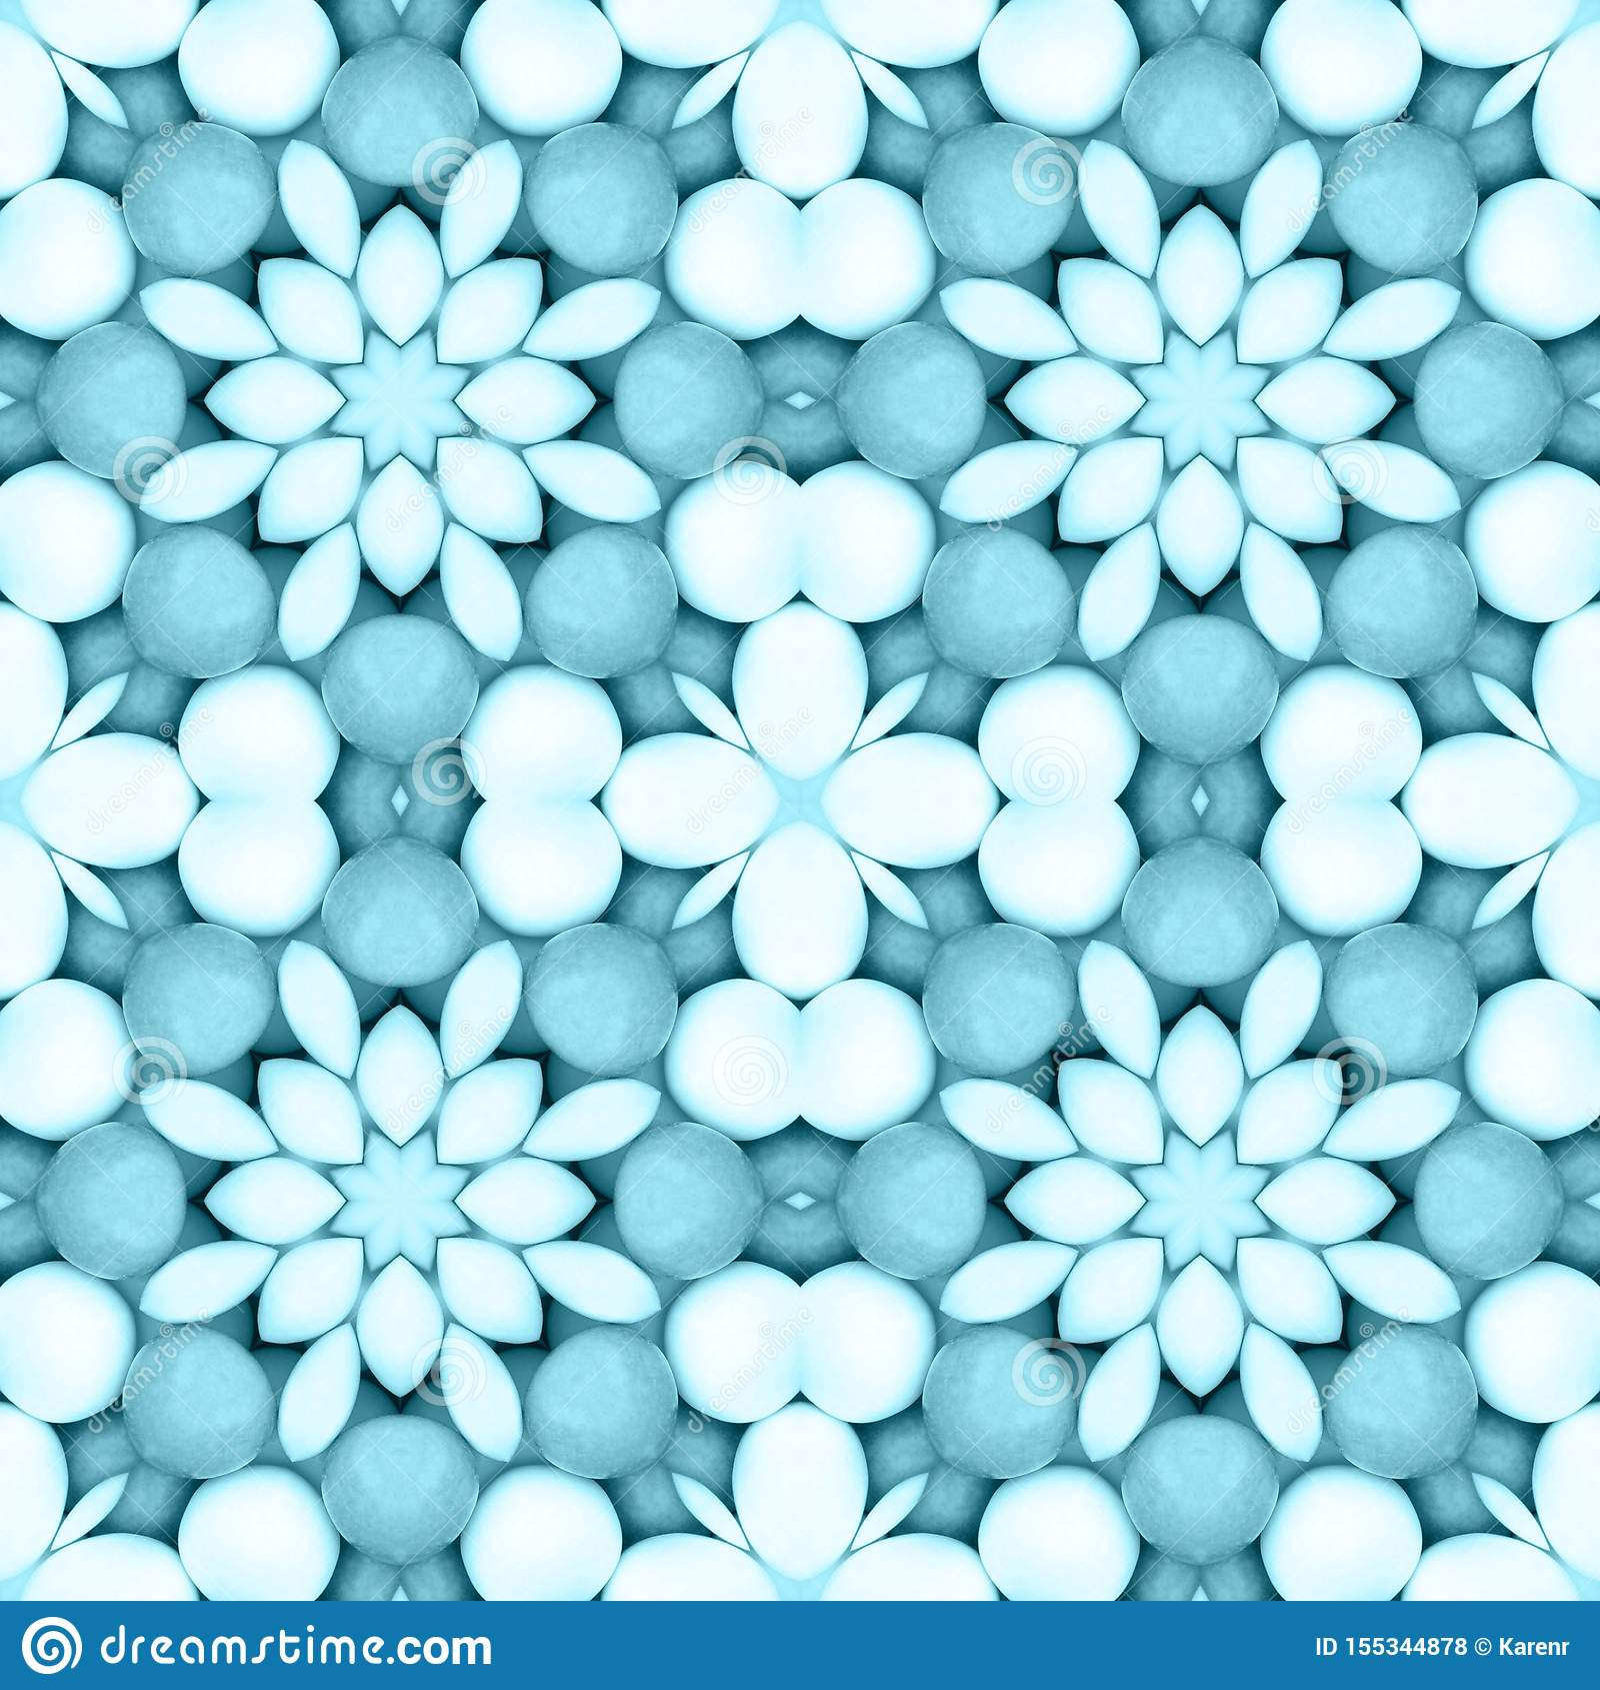 Blue flower mosaic detailed seamless textured pattern background